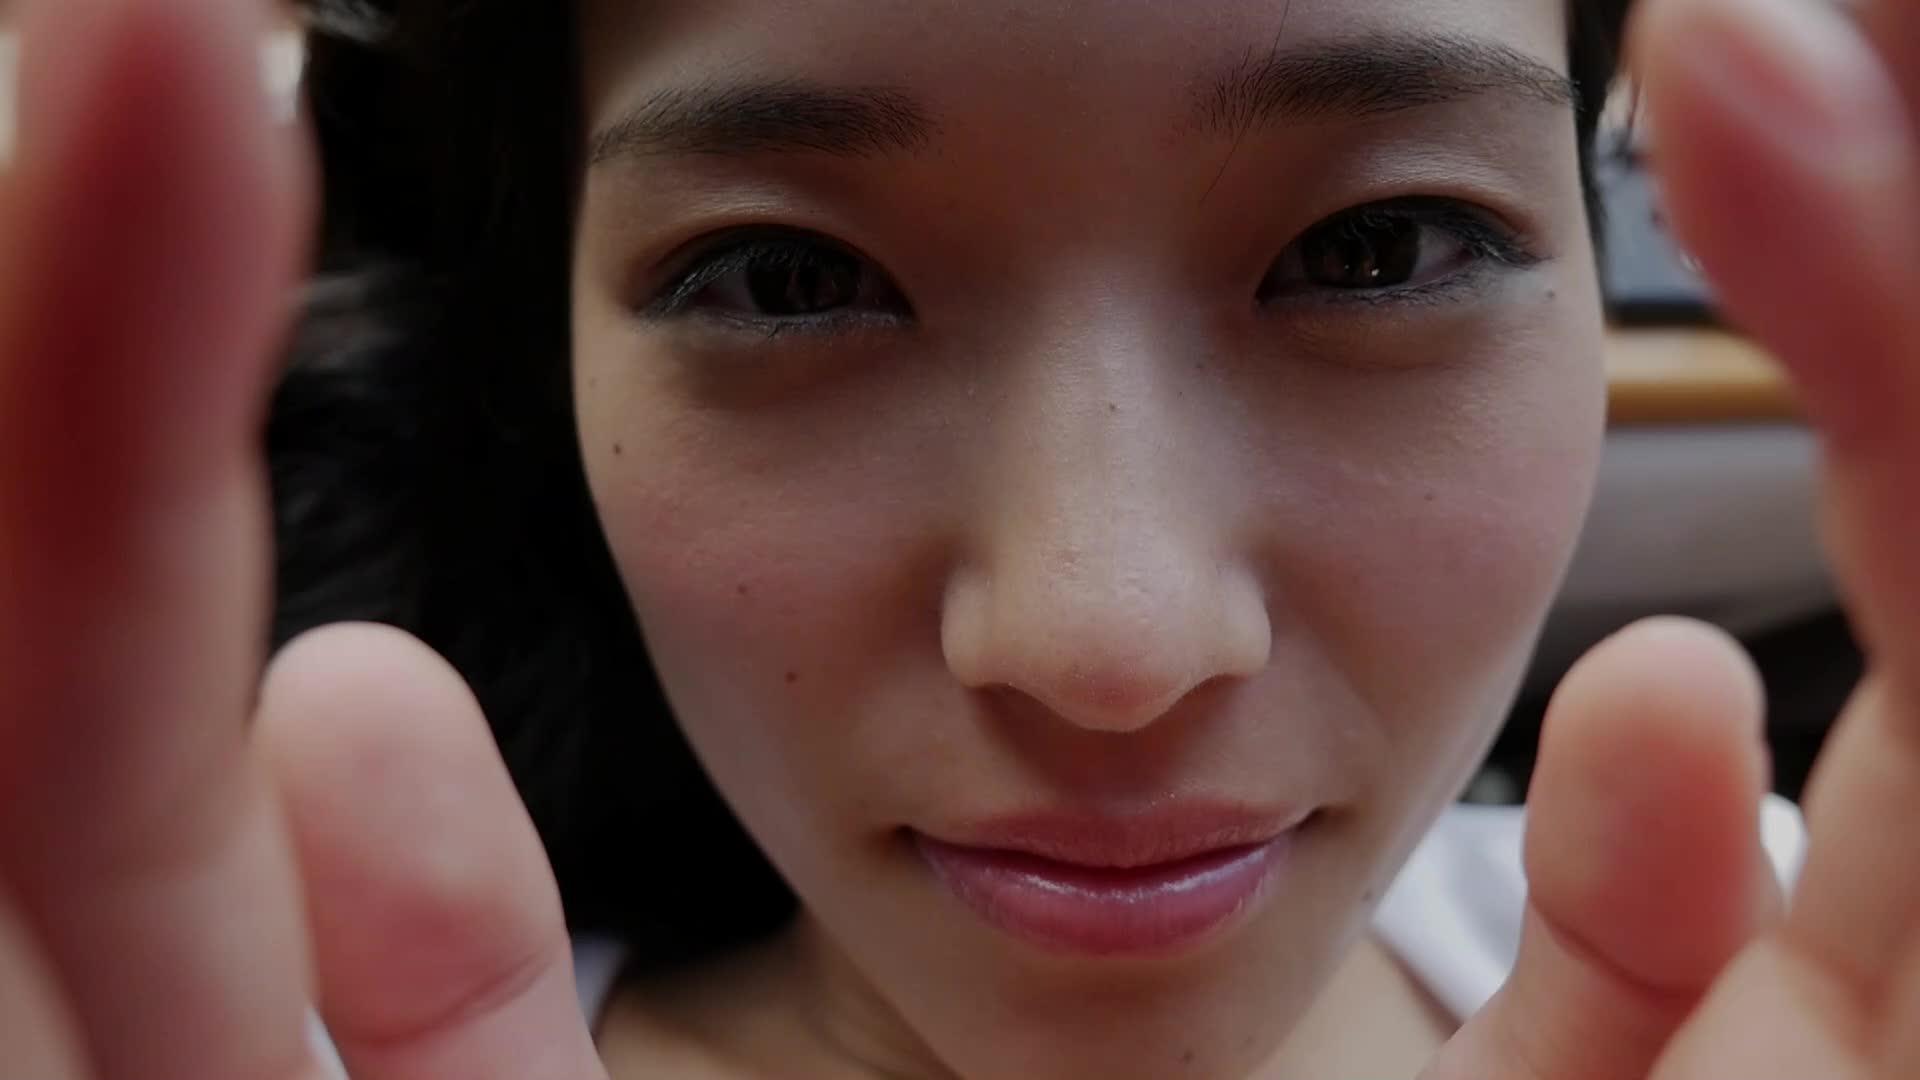 c8 - みすど 魅惑の透明感/宮脇麻那